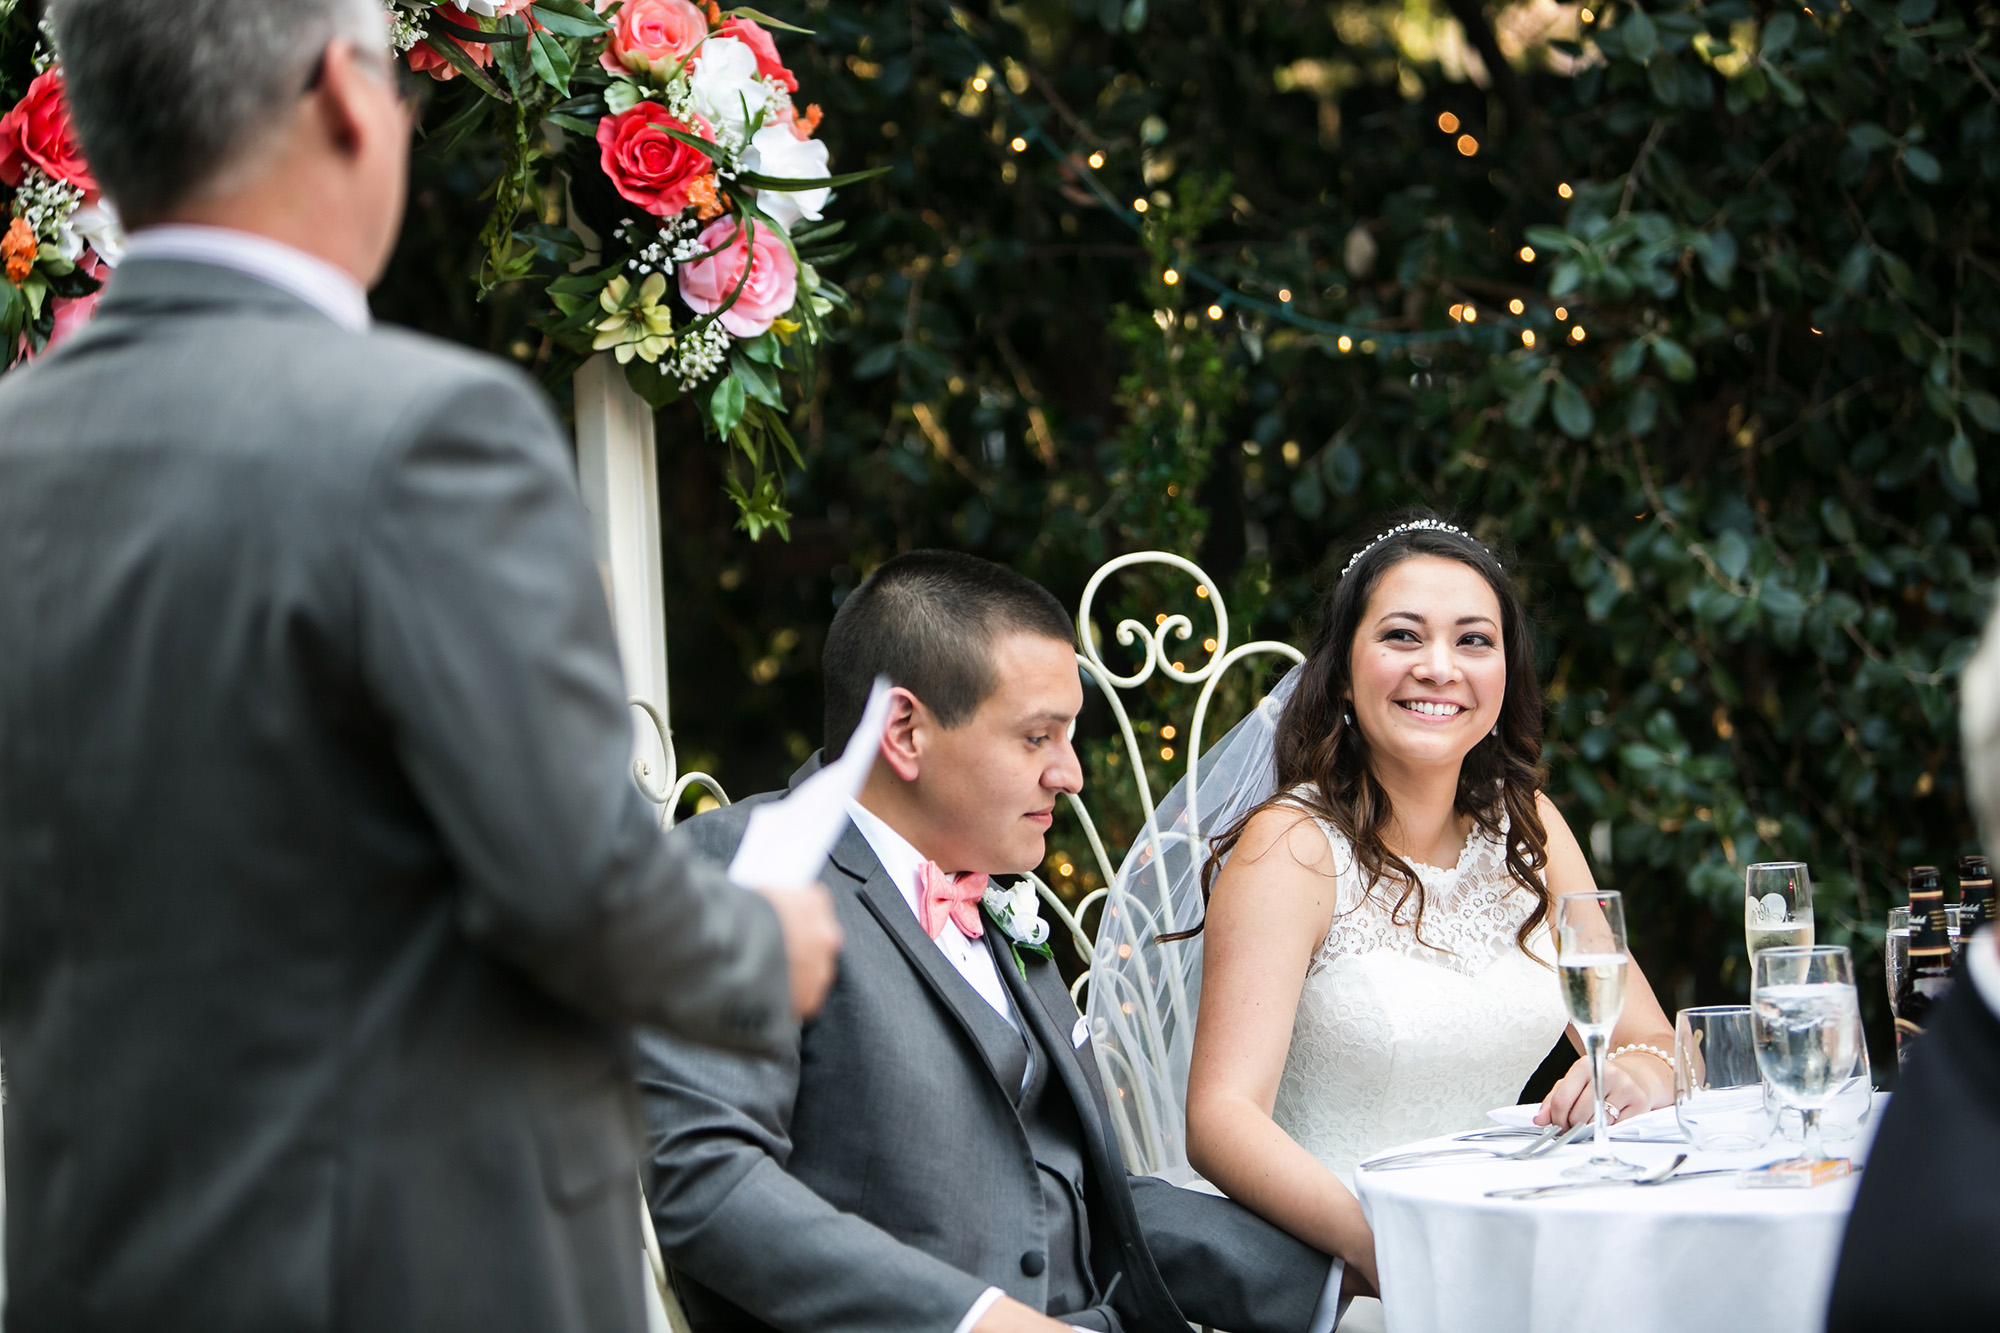 christmas-house-weddings-receptions-carrie-vines-141.jpg